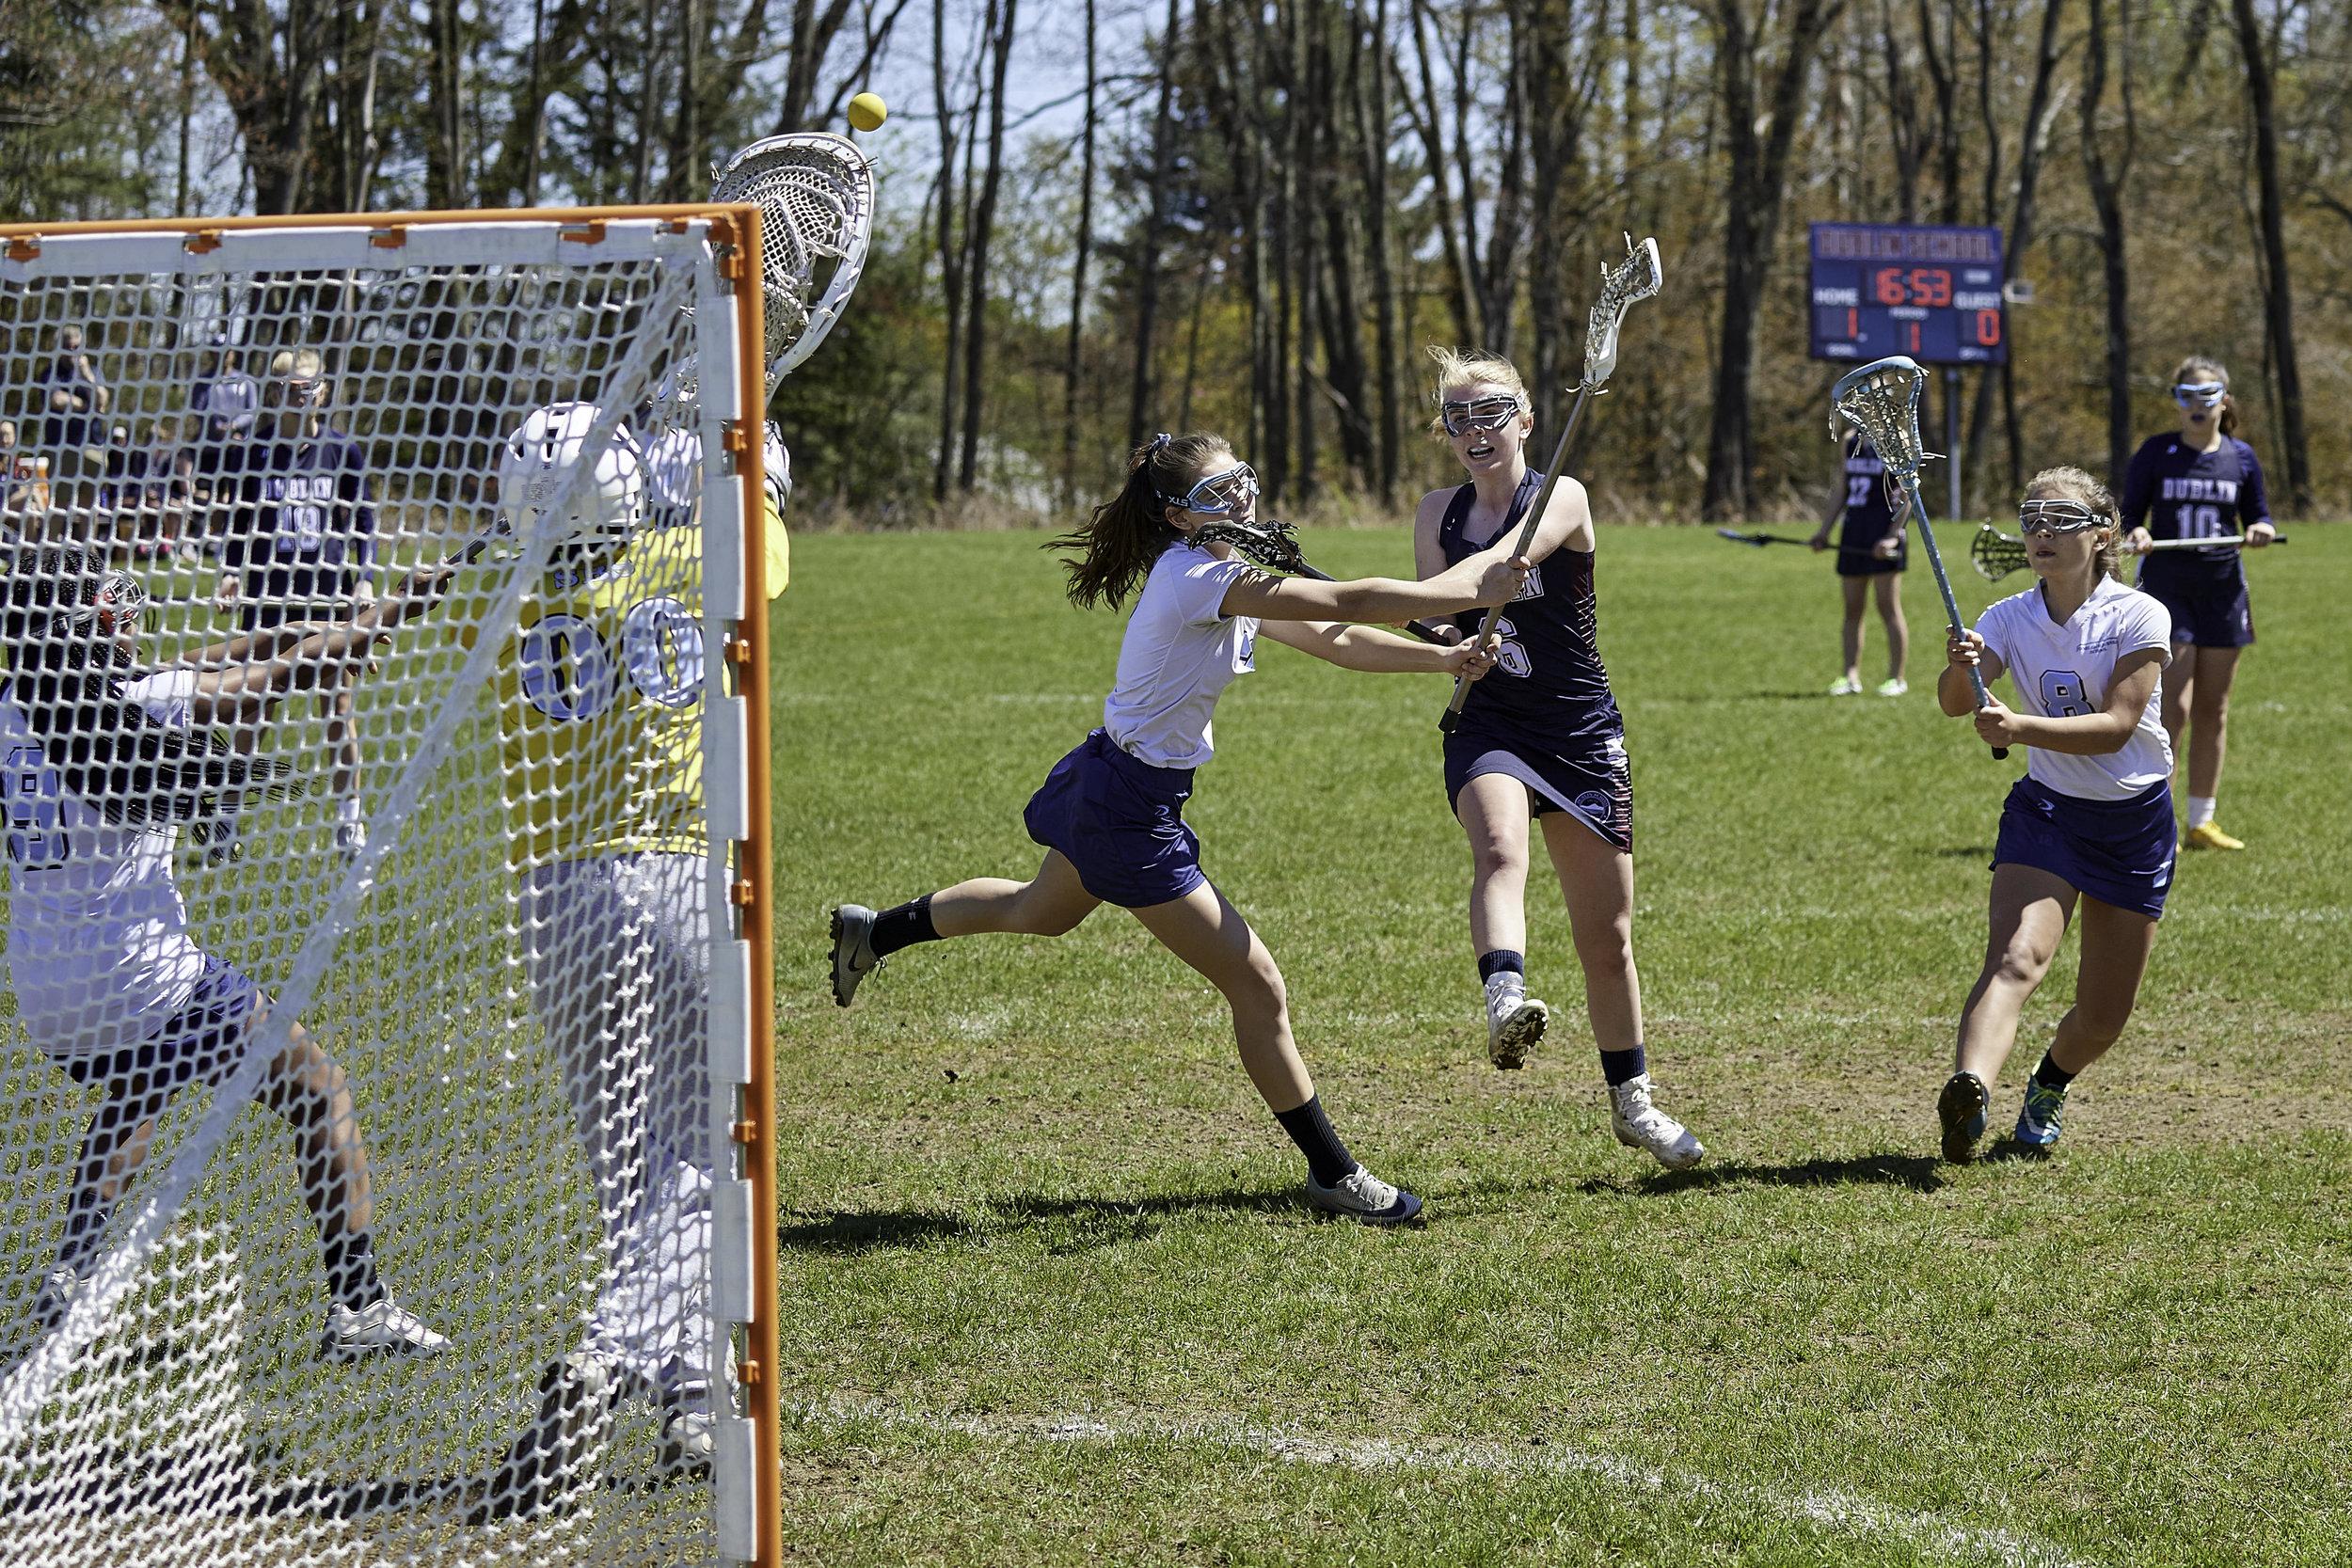 Girls Lacrosse vs. Stoneleigh Burnham School - May 11, 2019 - May 10, 2019193143.jpg